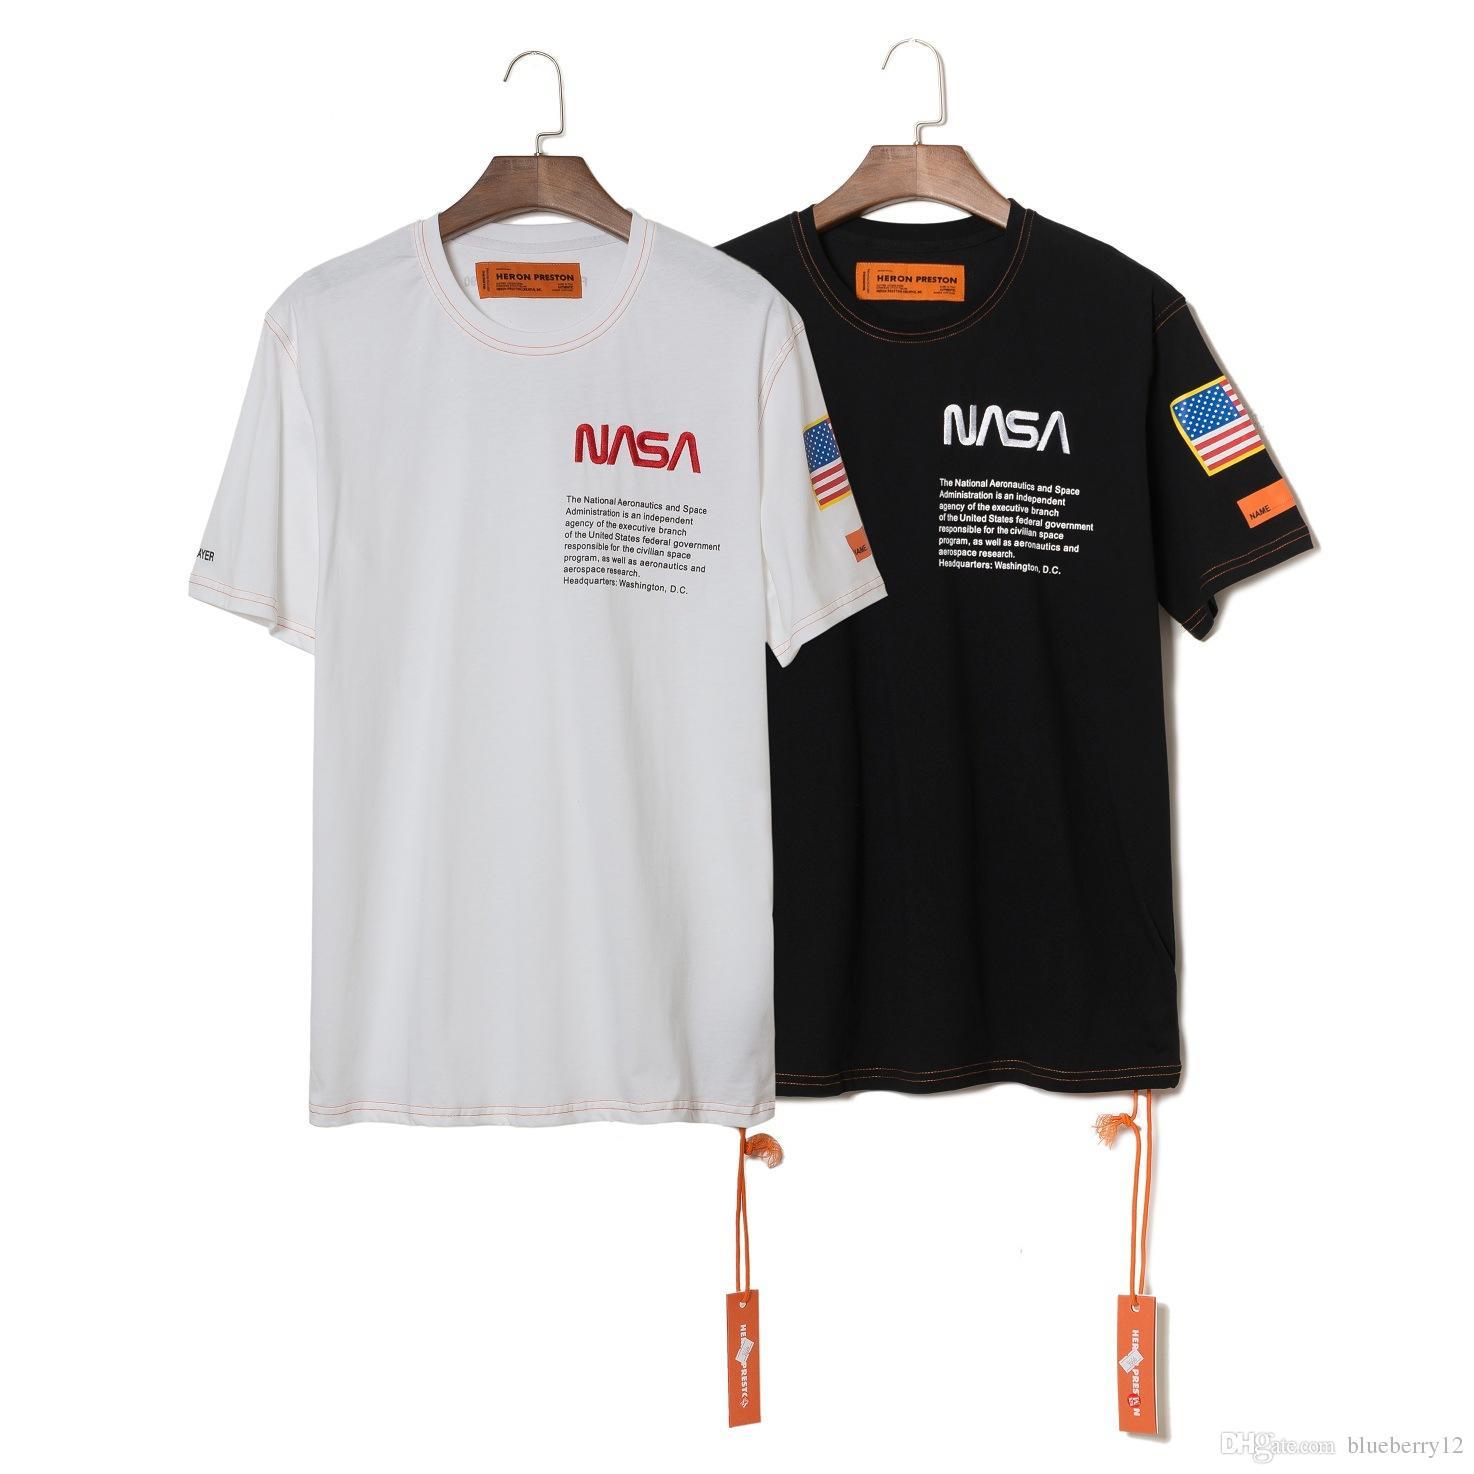 reputable site 0c6cc 50d7e NASA x Heron Preston T Shirt Herren Sommer Kurzarm T Shirts Emboridered  Crewneck Lässige Tops 2 Farben